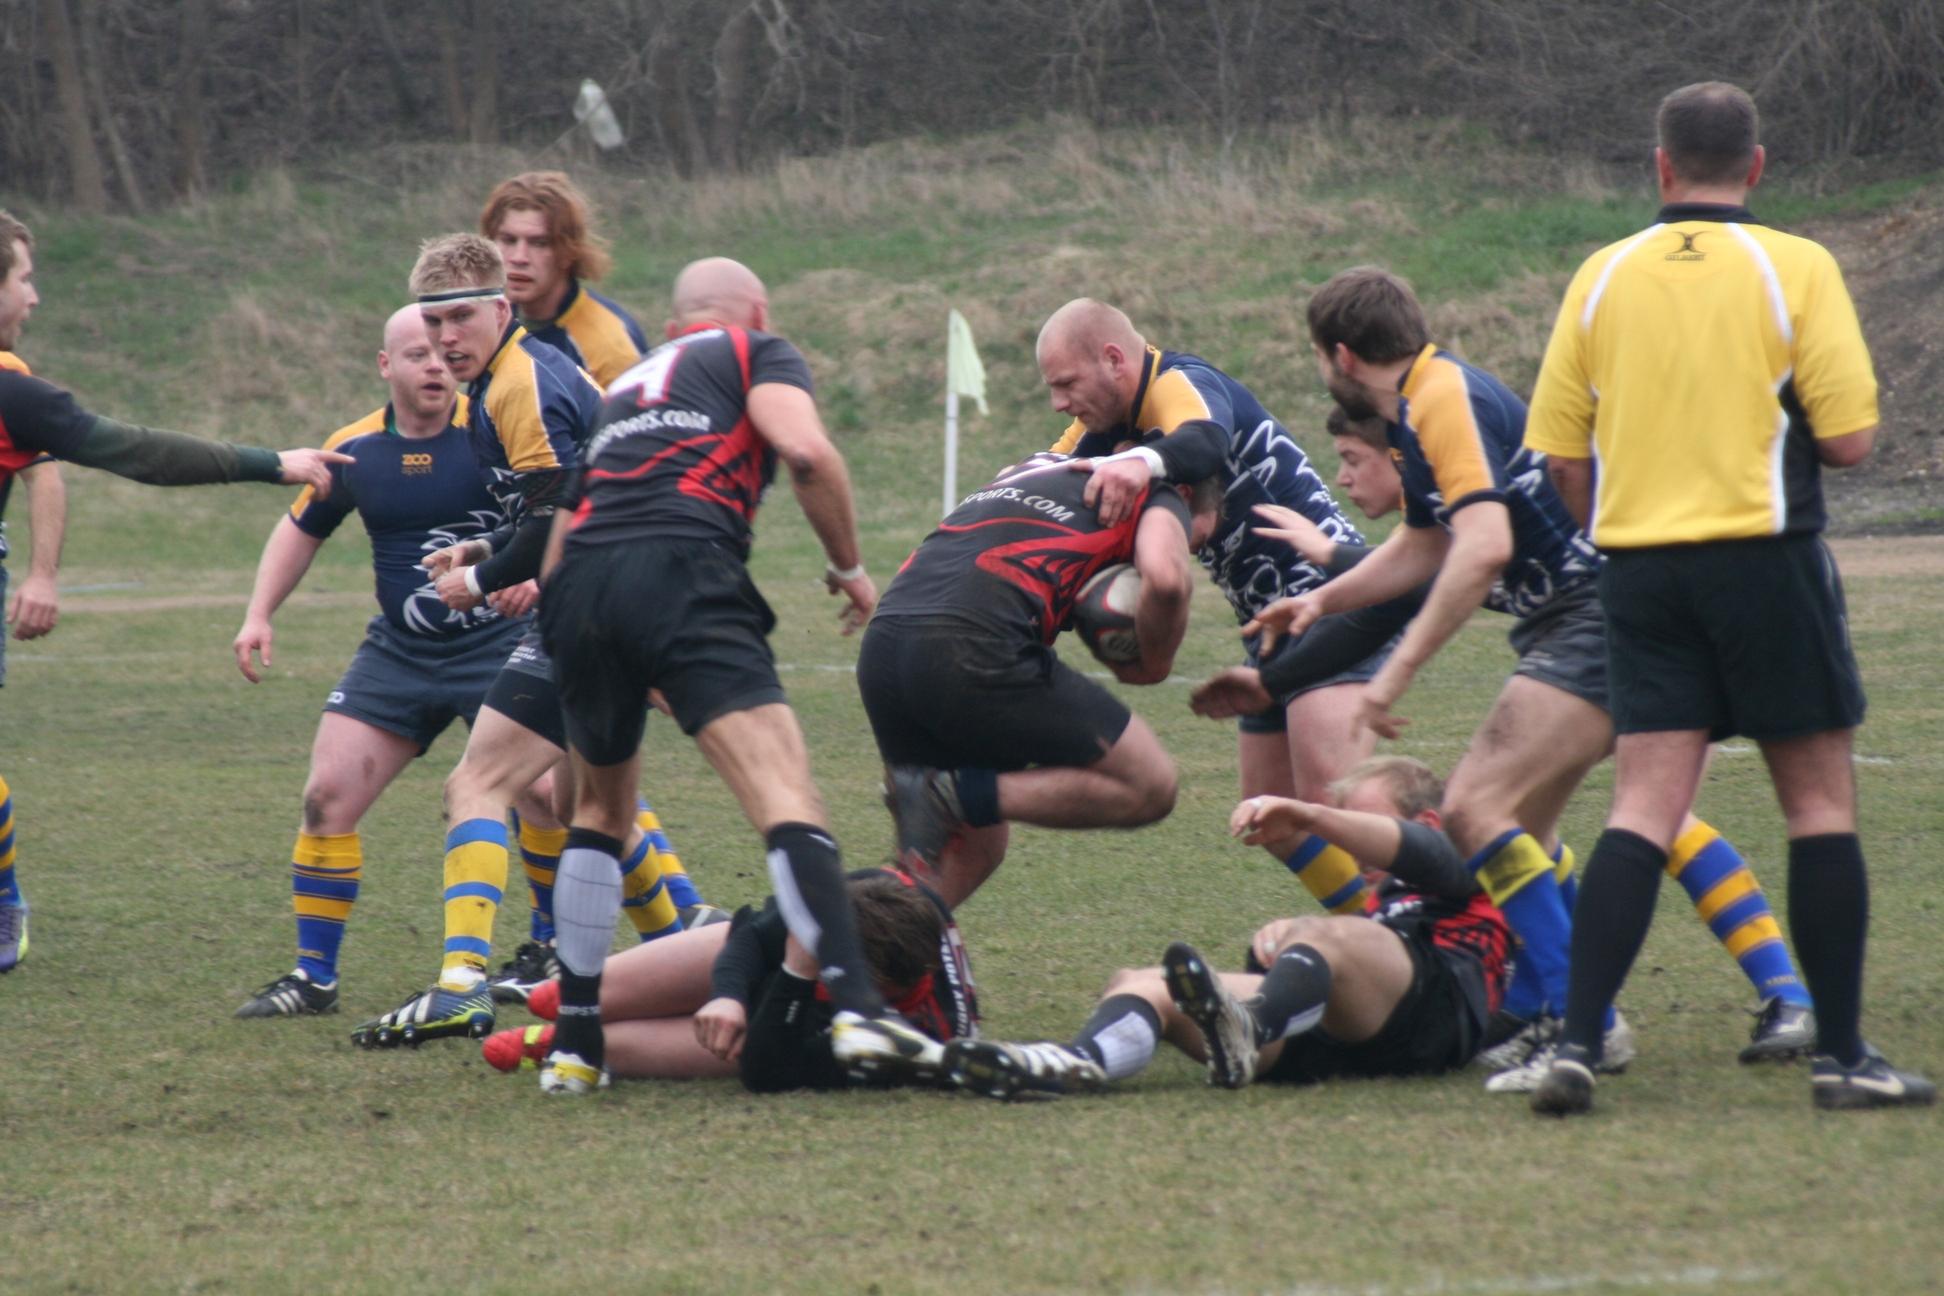 Leipzig Rugby